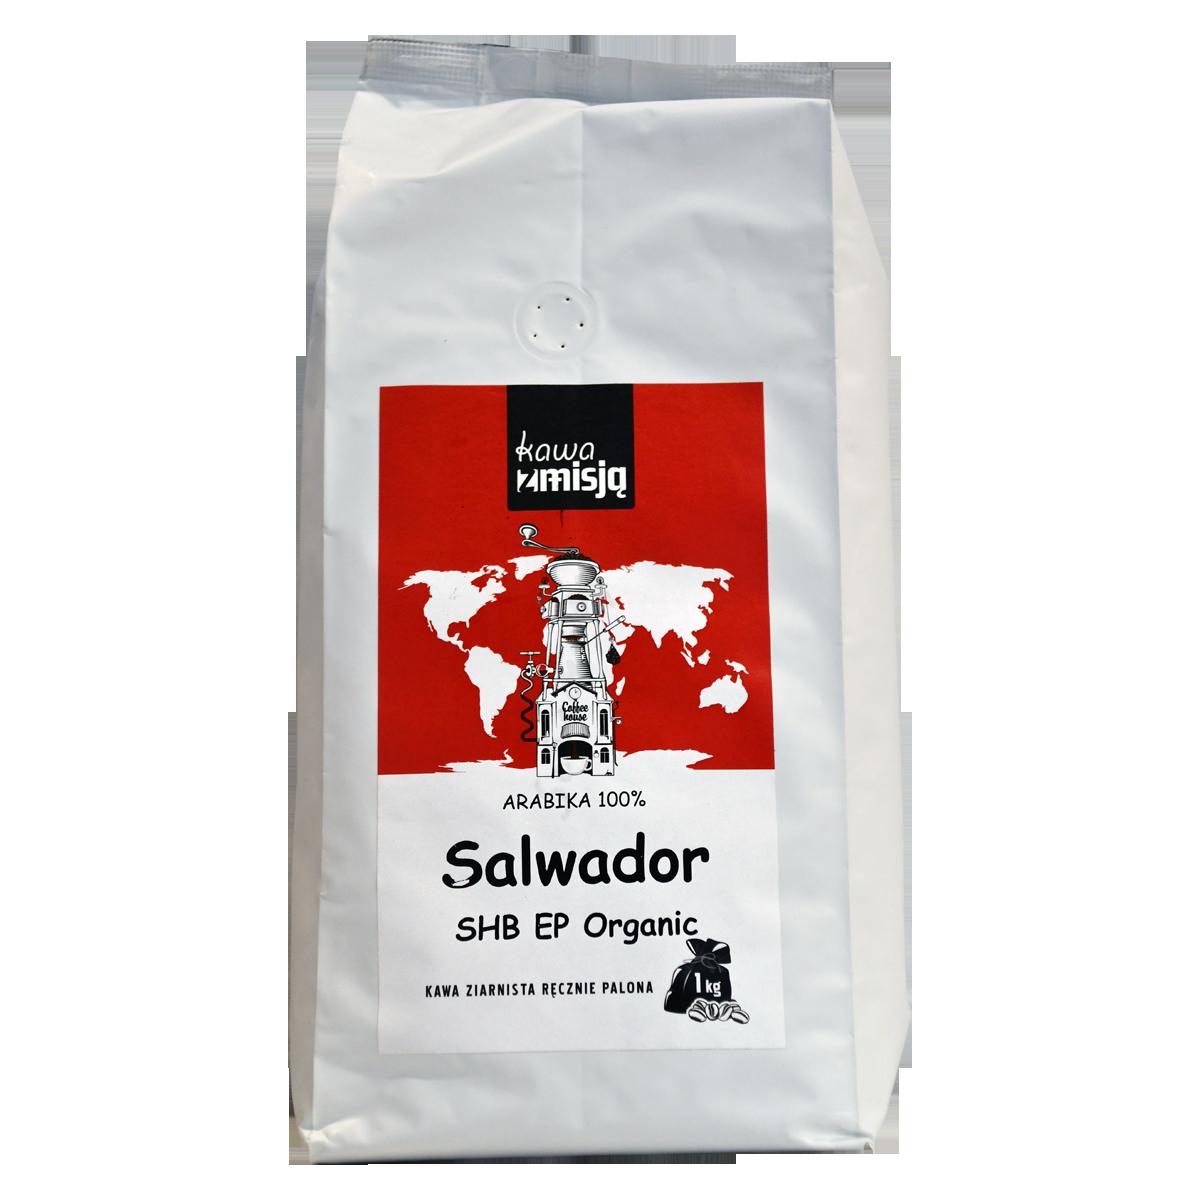 salwador_kilo